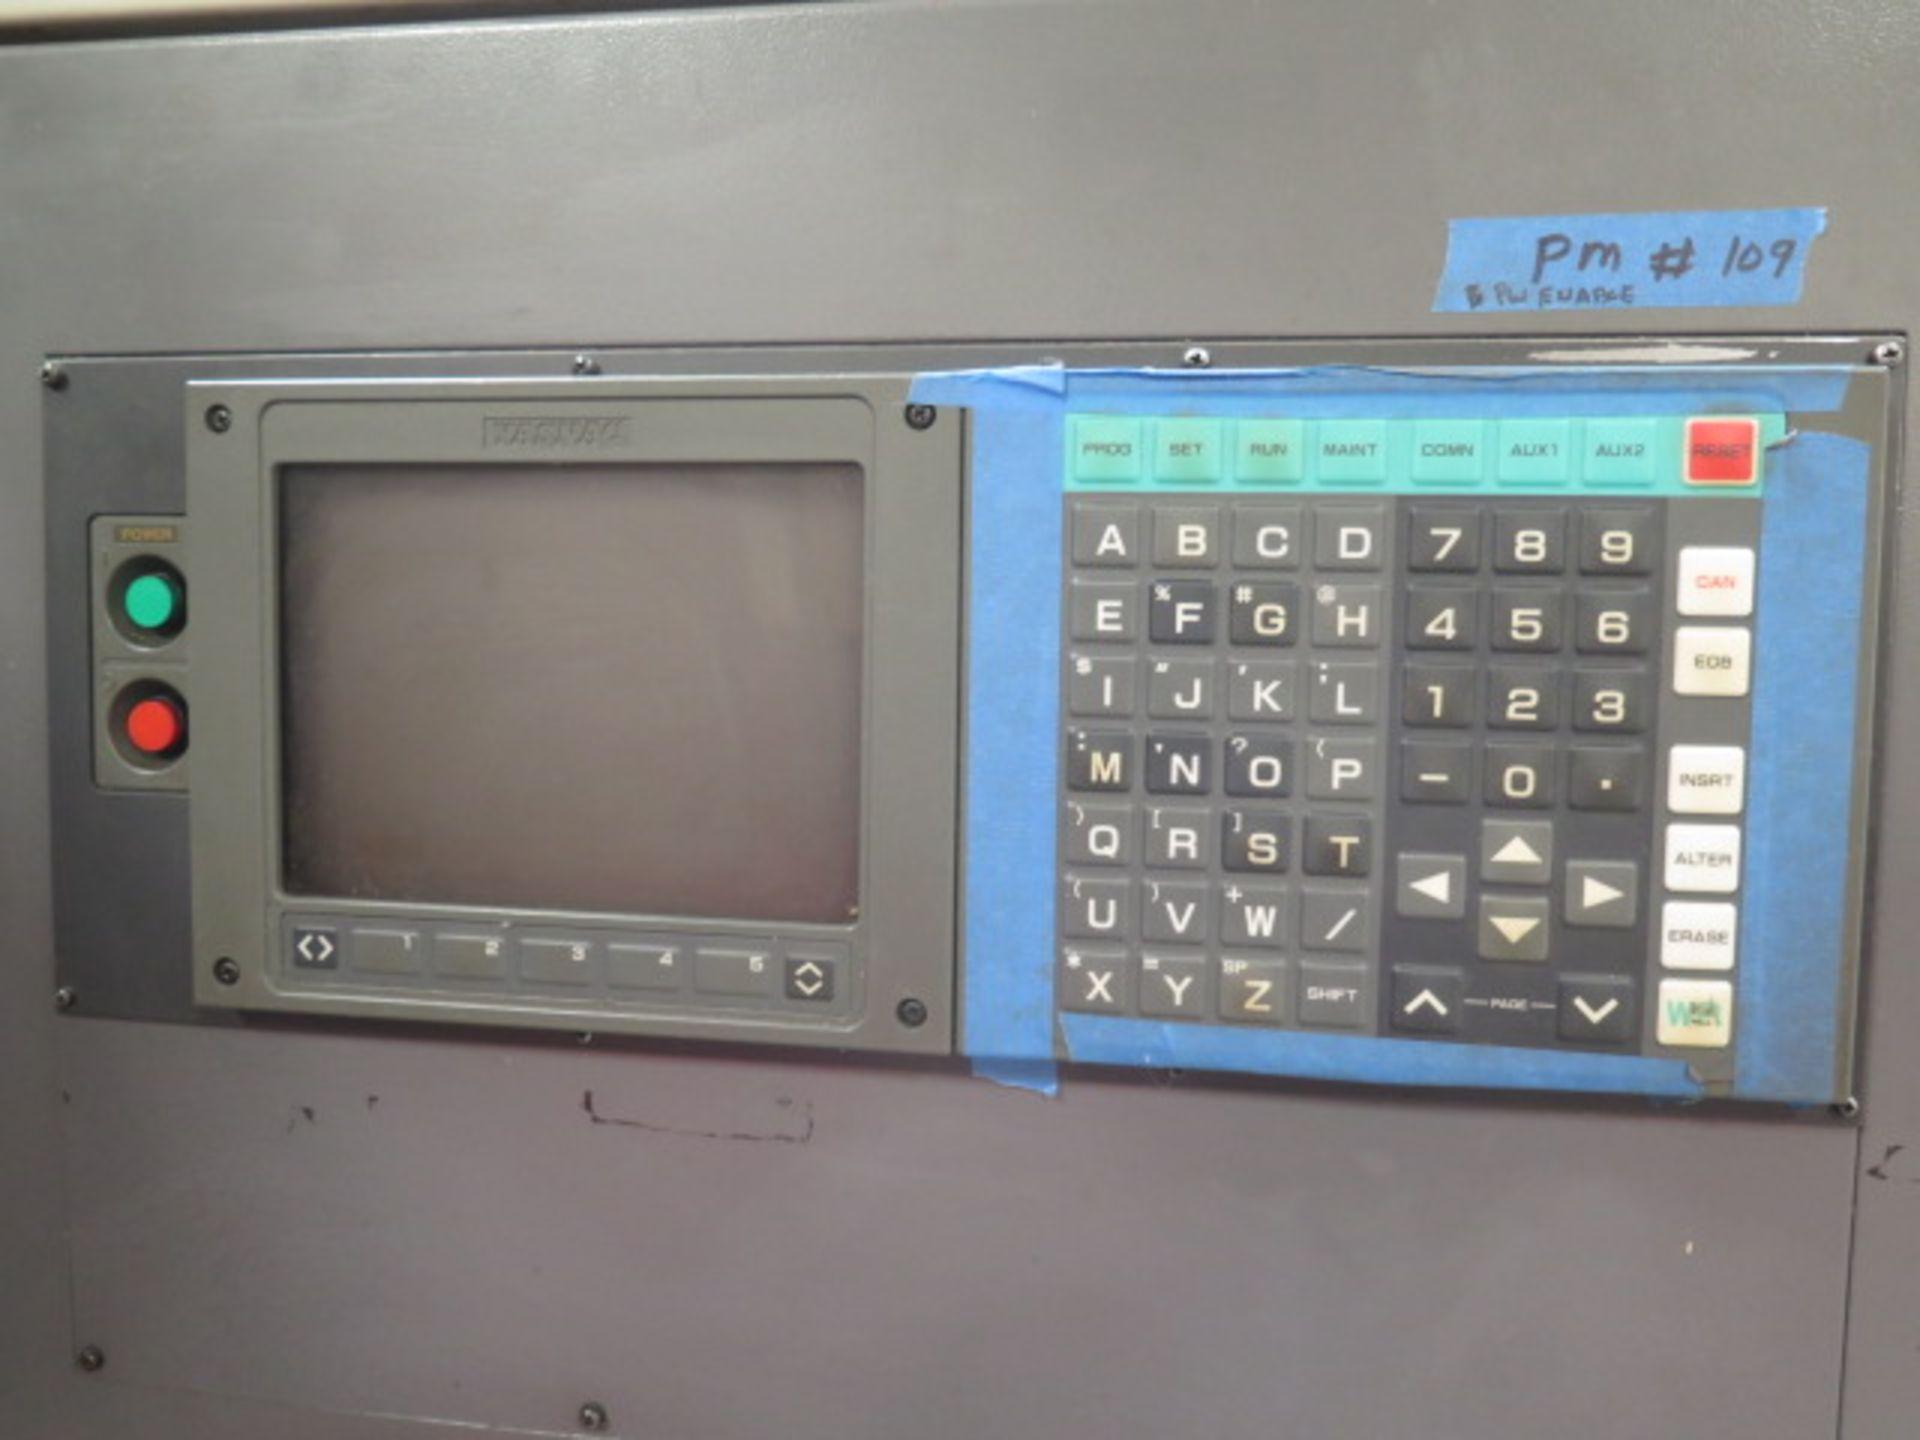 1992 Matsuura MC-450H-30-PC II 10-Pallet CNC Horizontal Machining Center s/n 910609609, SOLD AS IS - Image 5 of 23